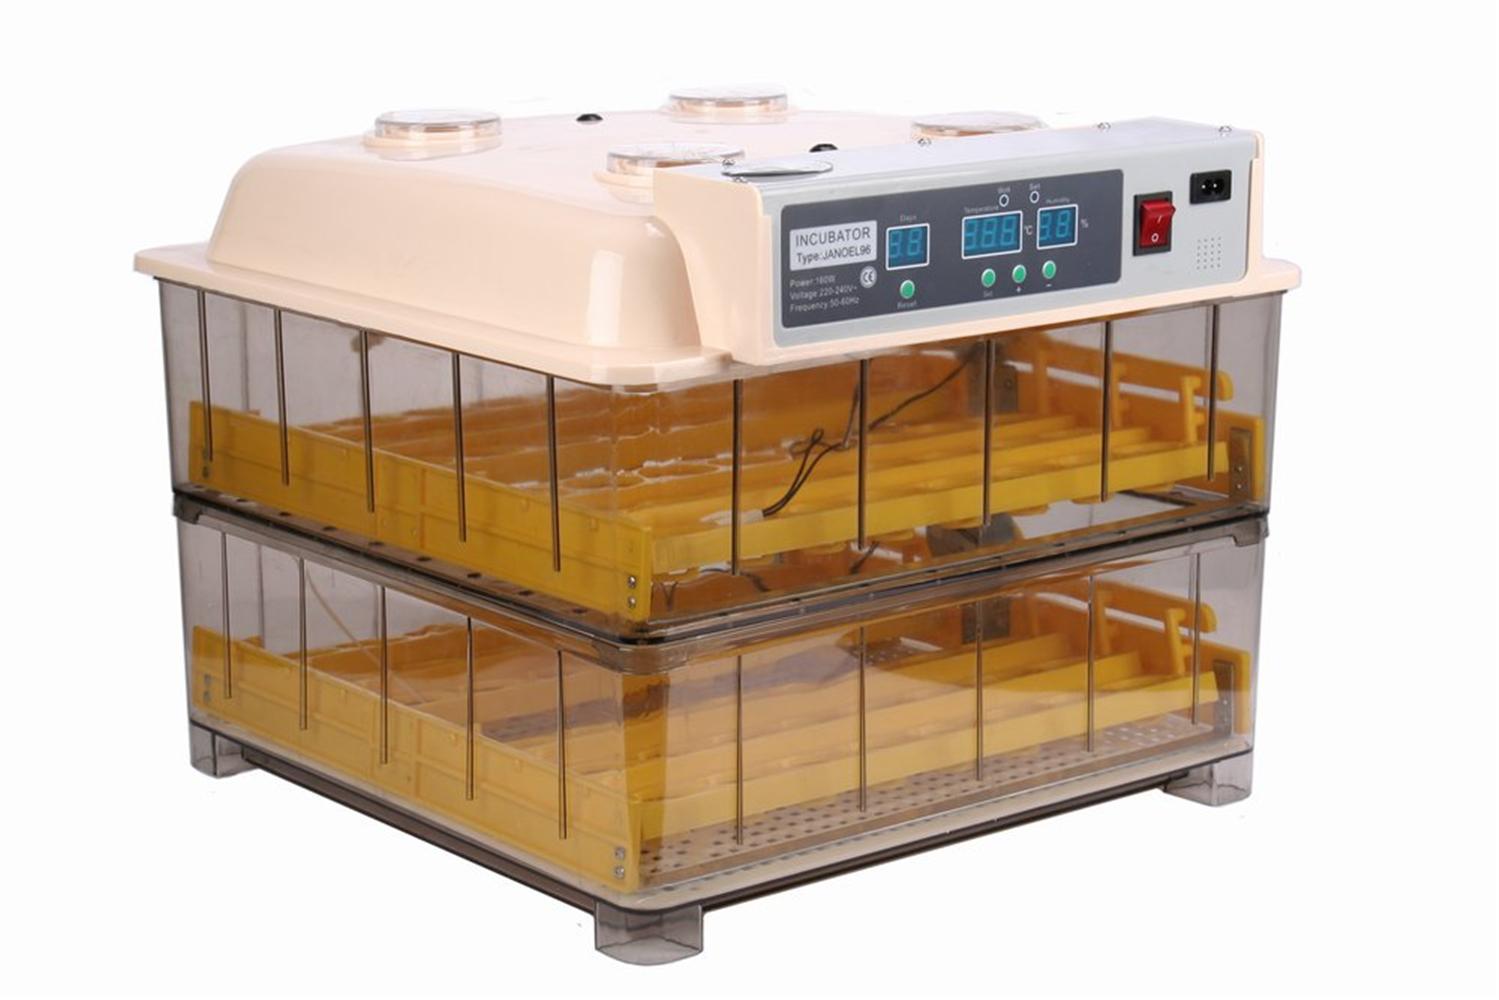 Janoel Automatic Egg Incubator 96 Chicken Incubator